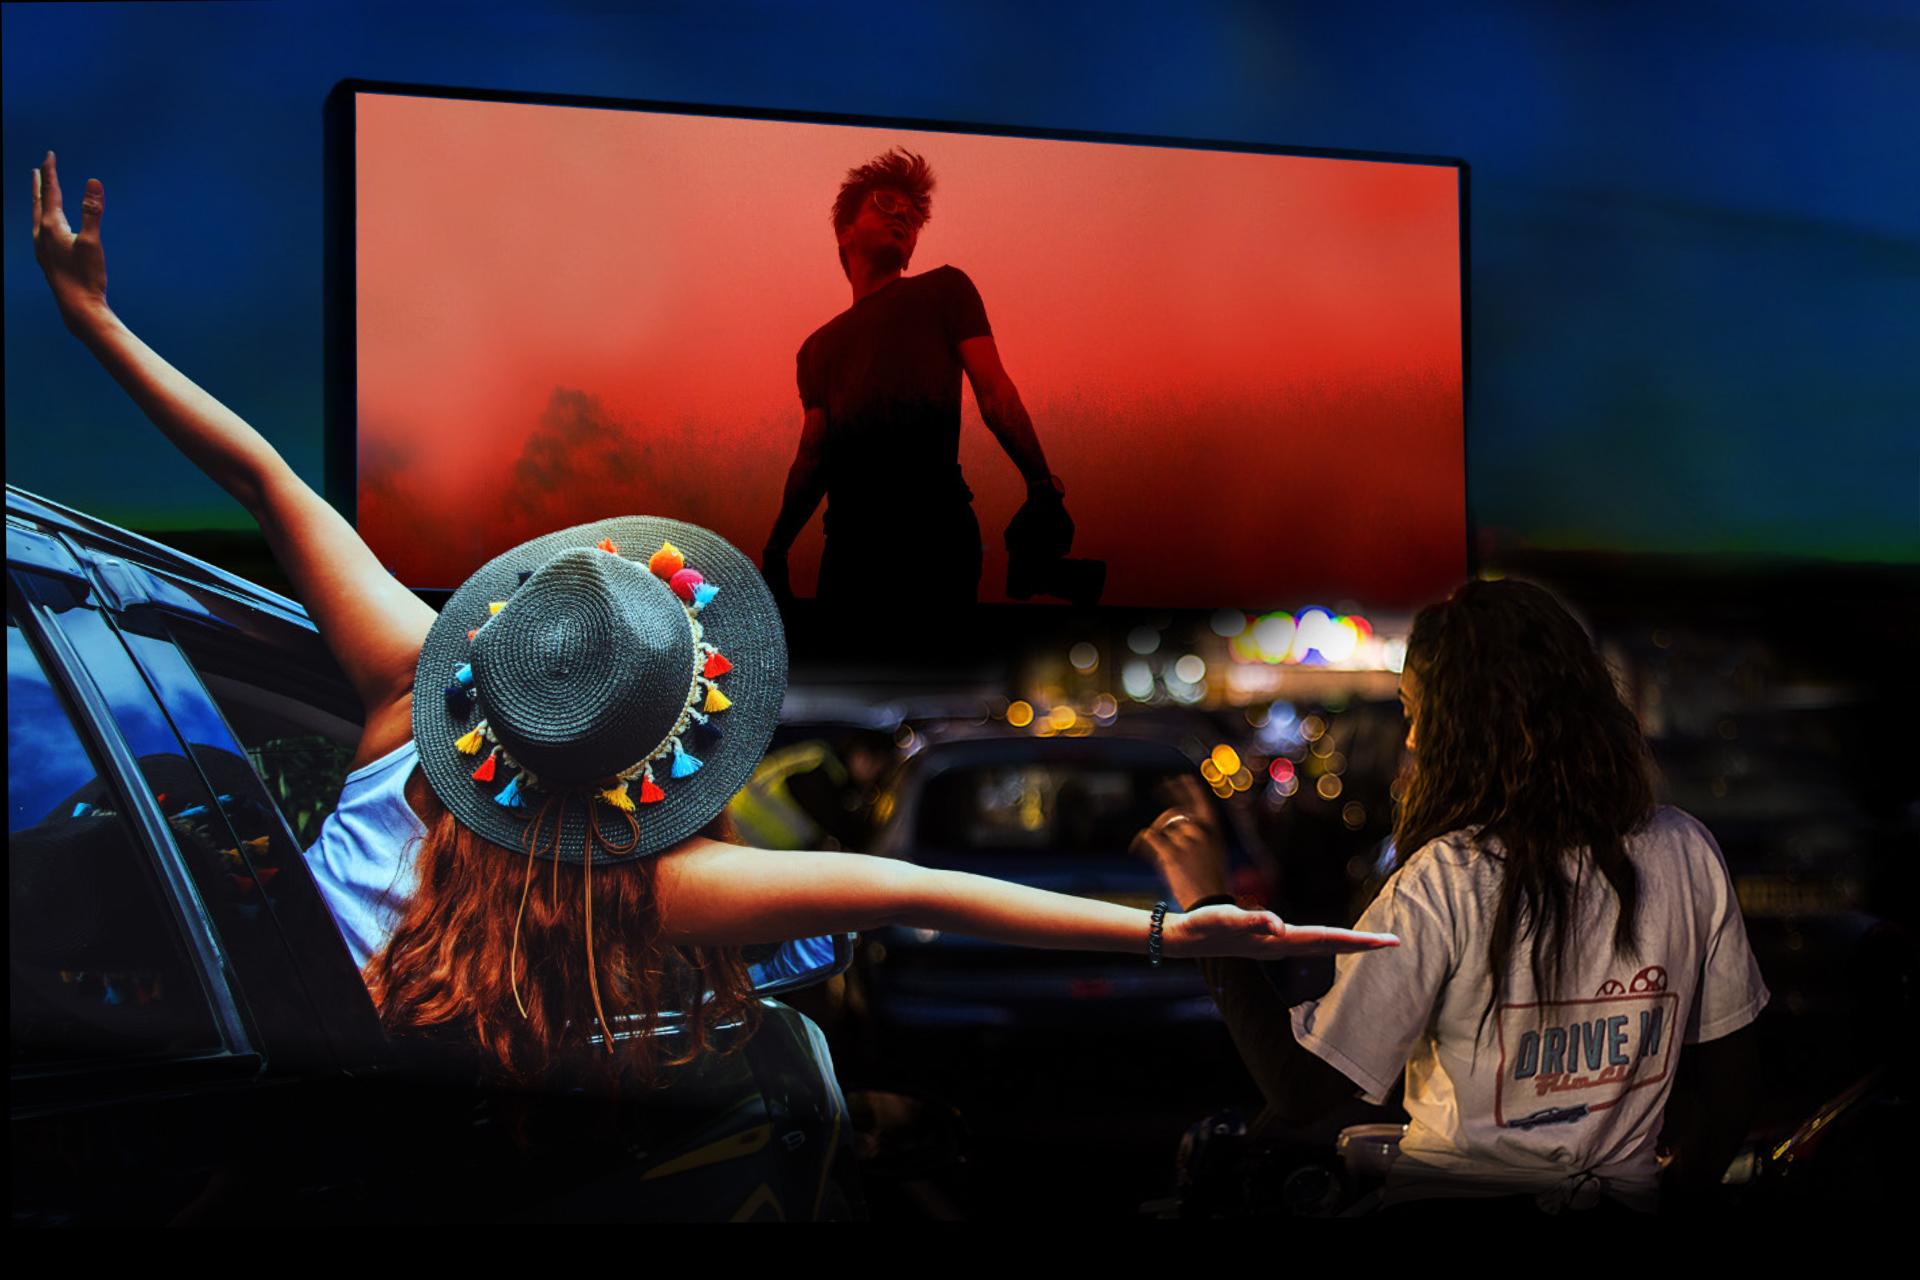 Cinema at the Stadia